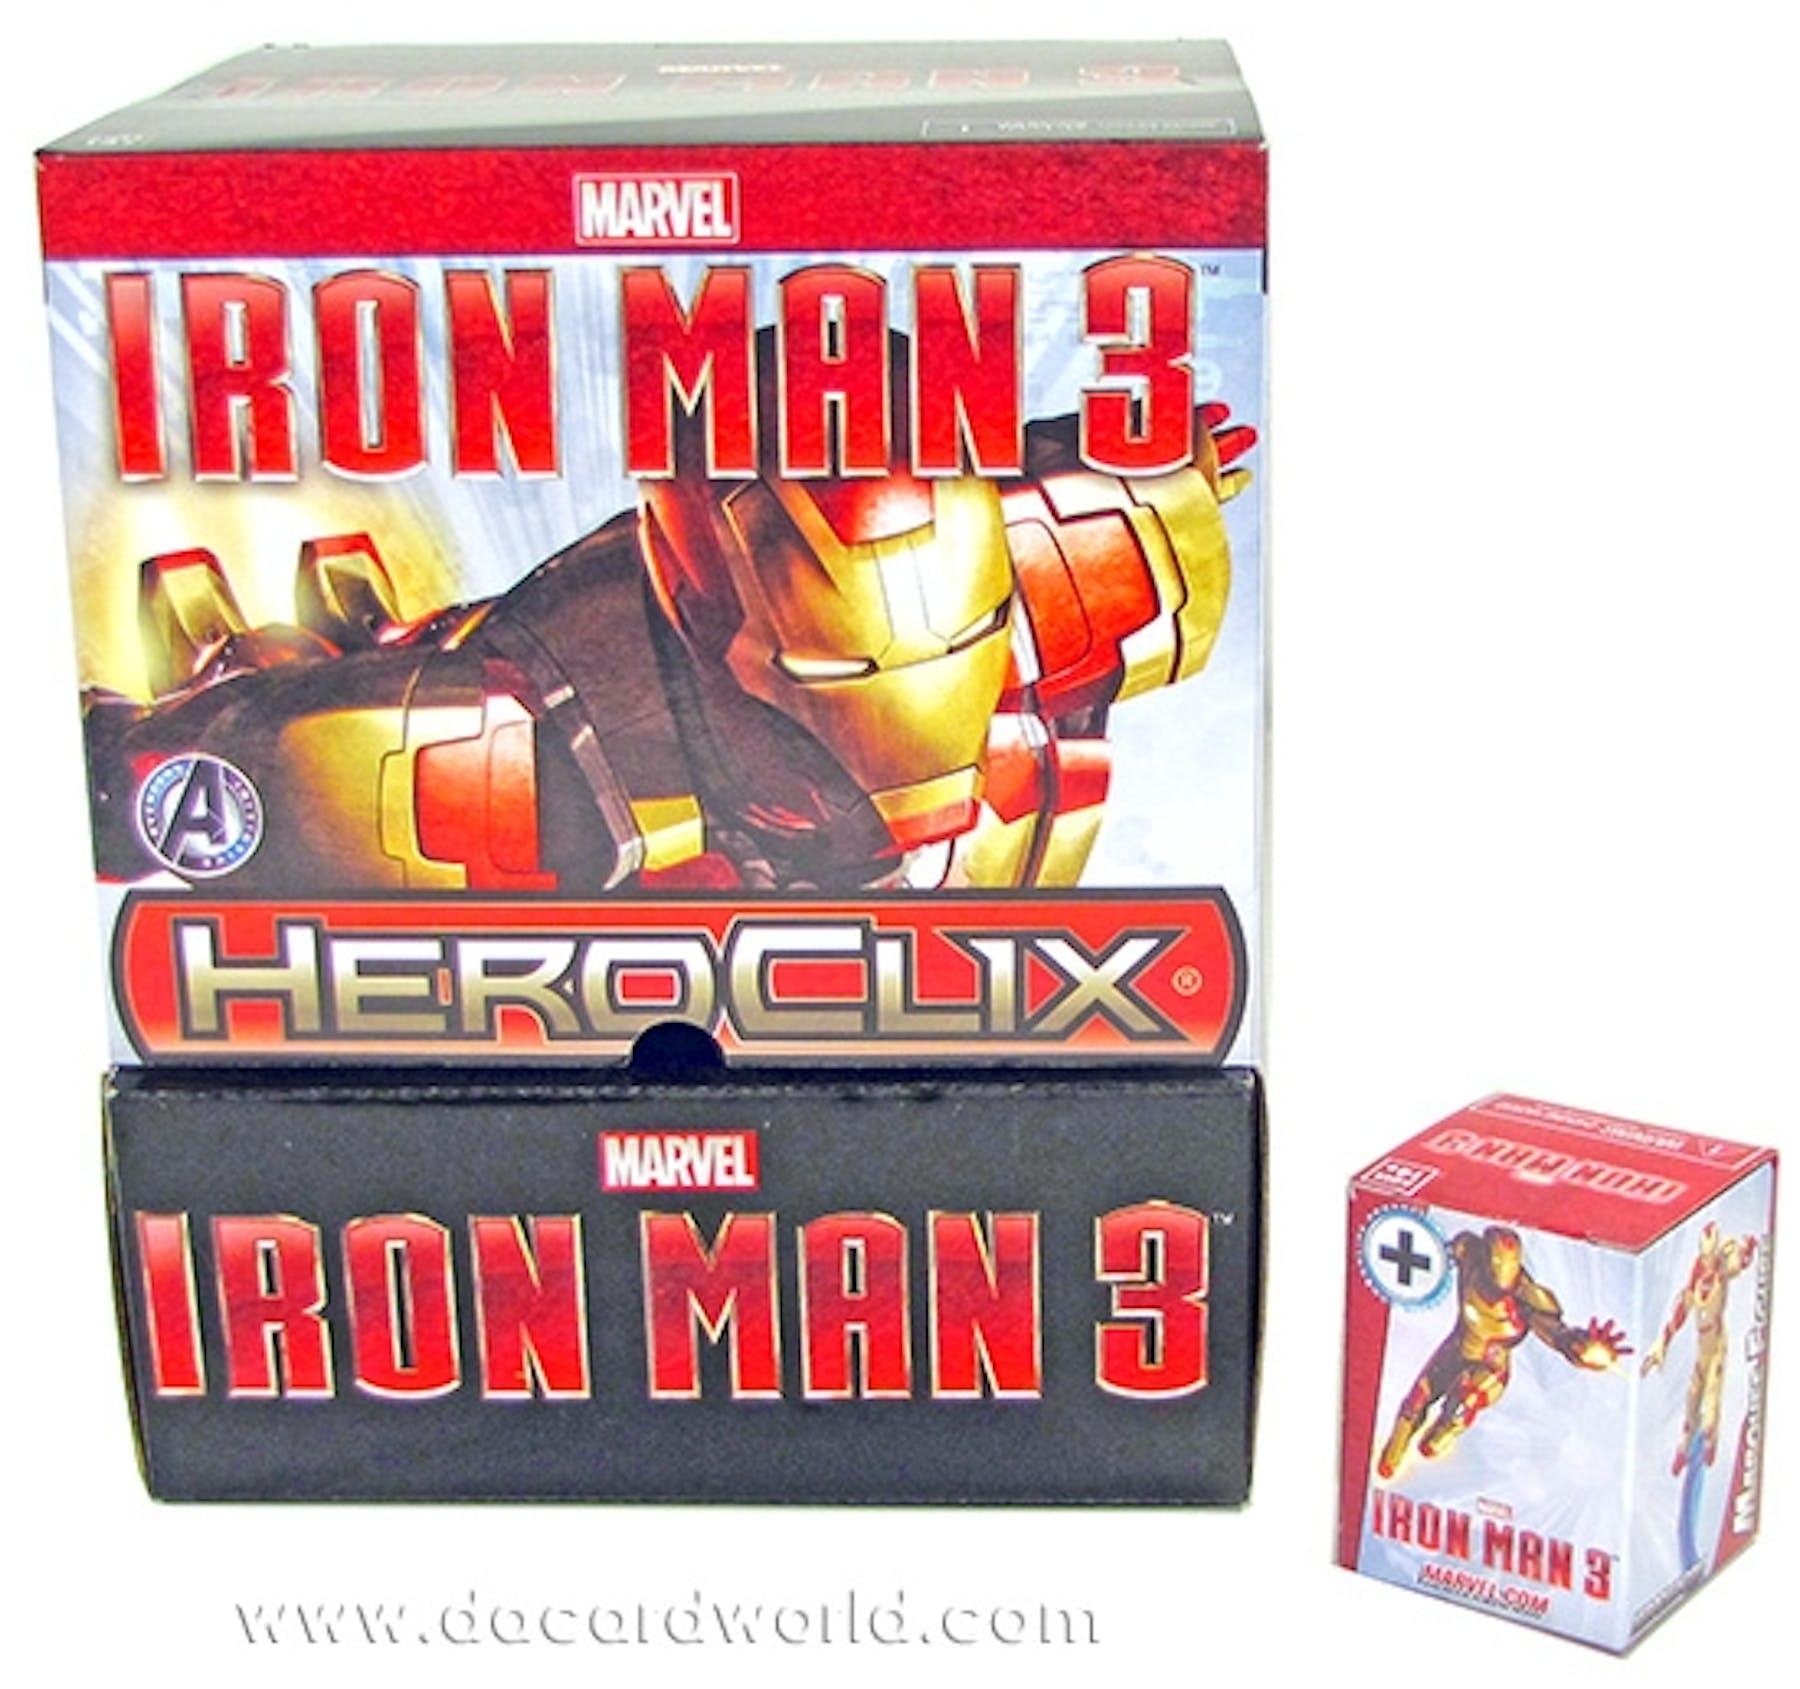 Marvel HeroClix Iron Man 3 24-Pack Booster Box